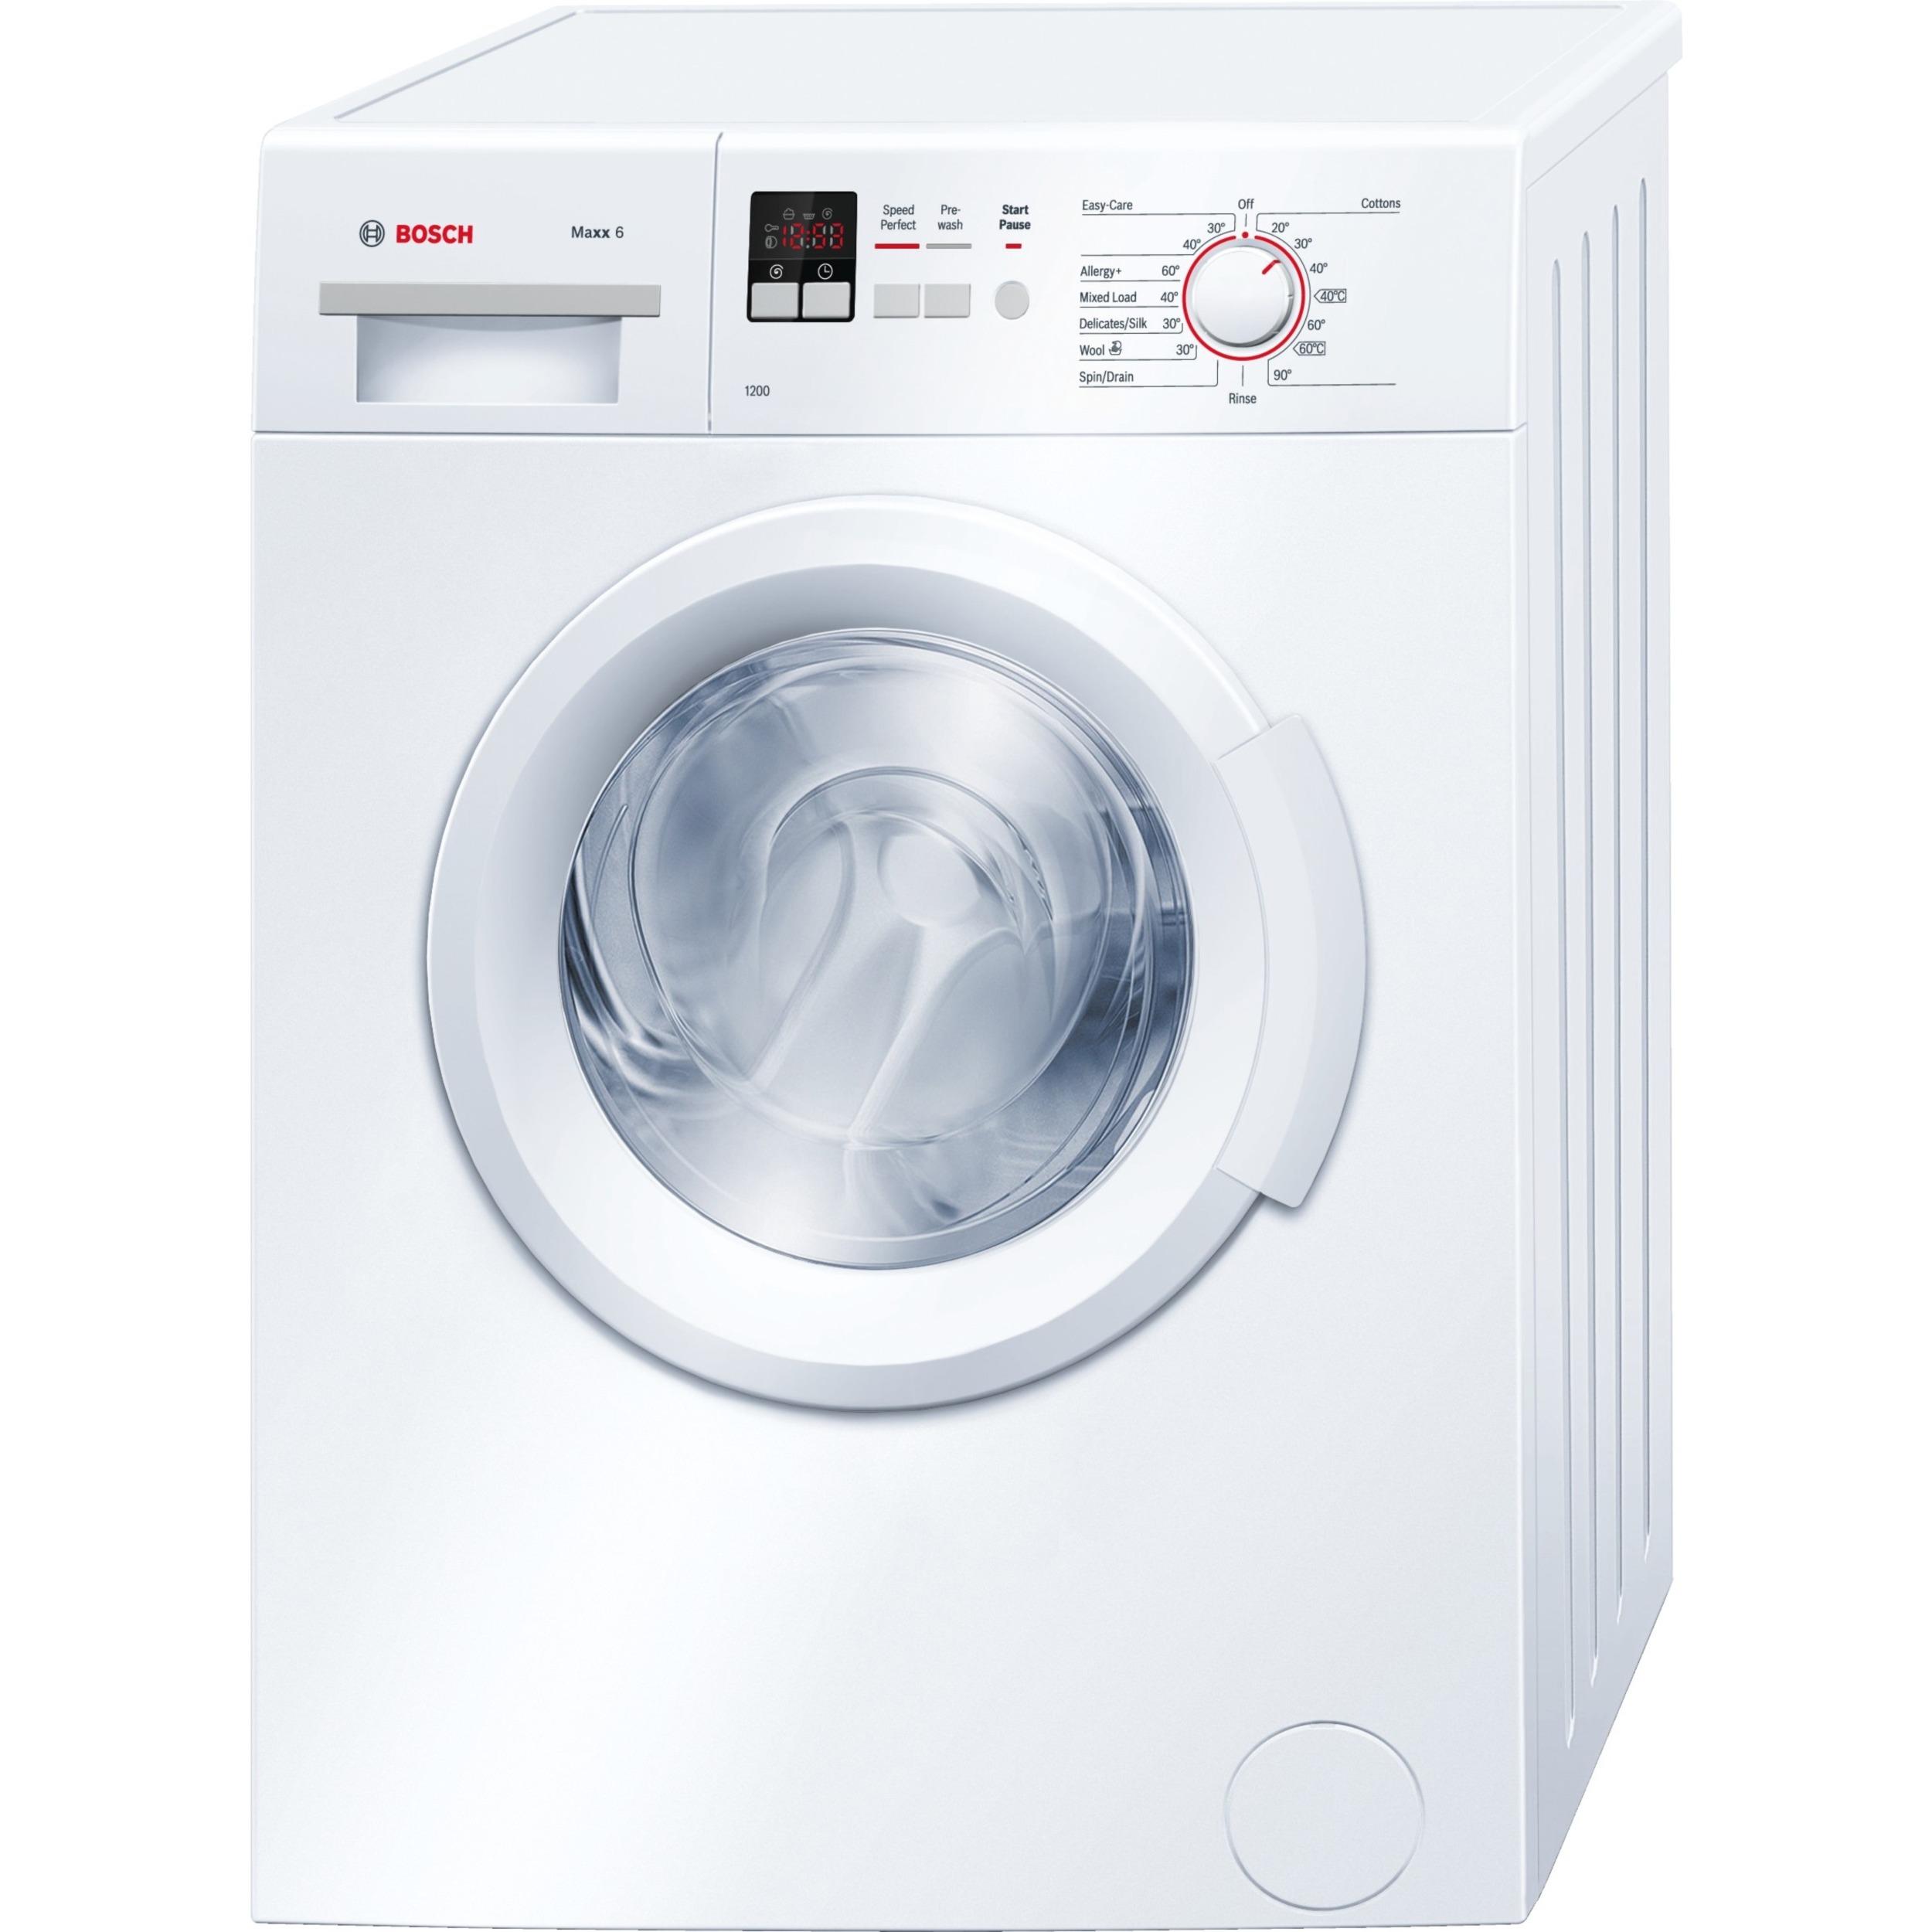 Standard Washing Machine Width Bosch 6 Kg Automatic Washing Machine Wab24161gb